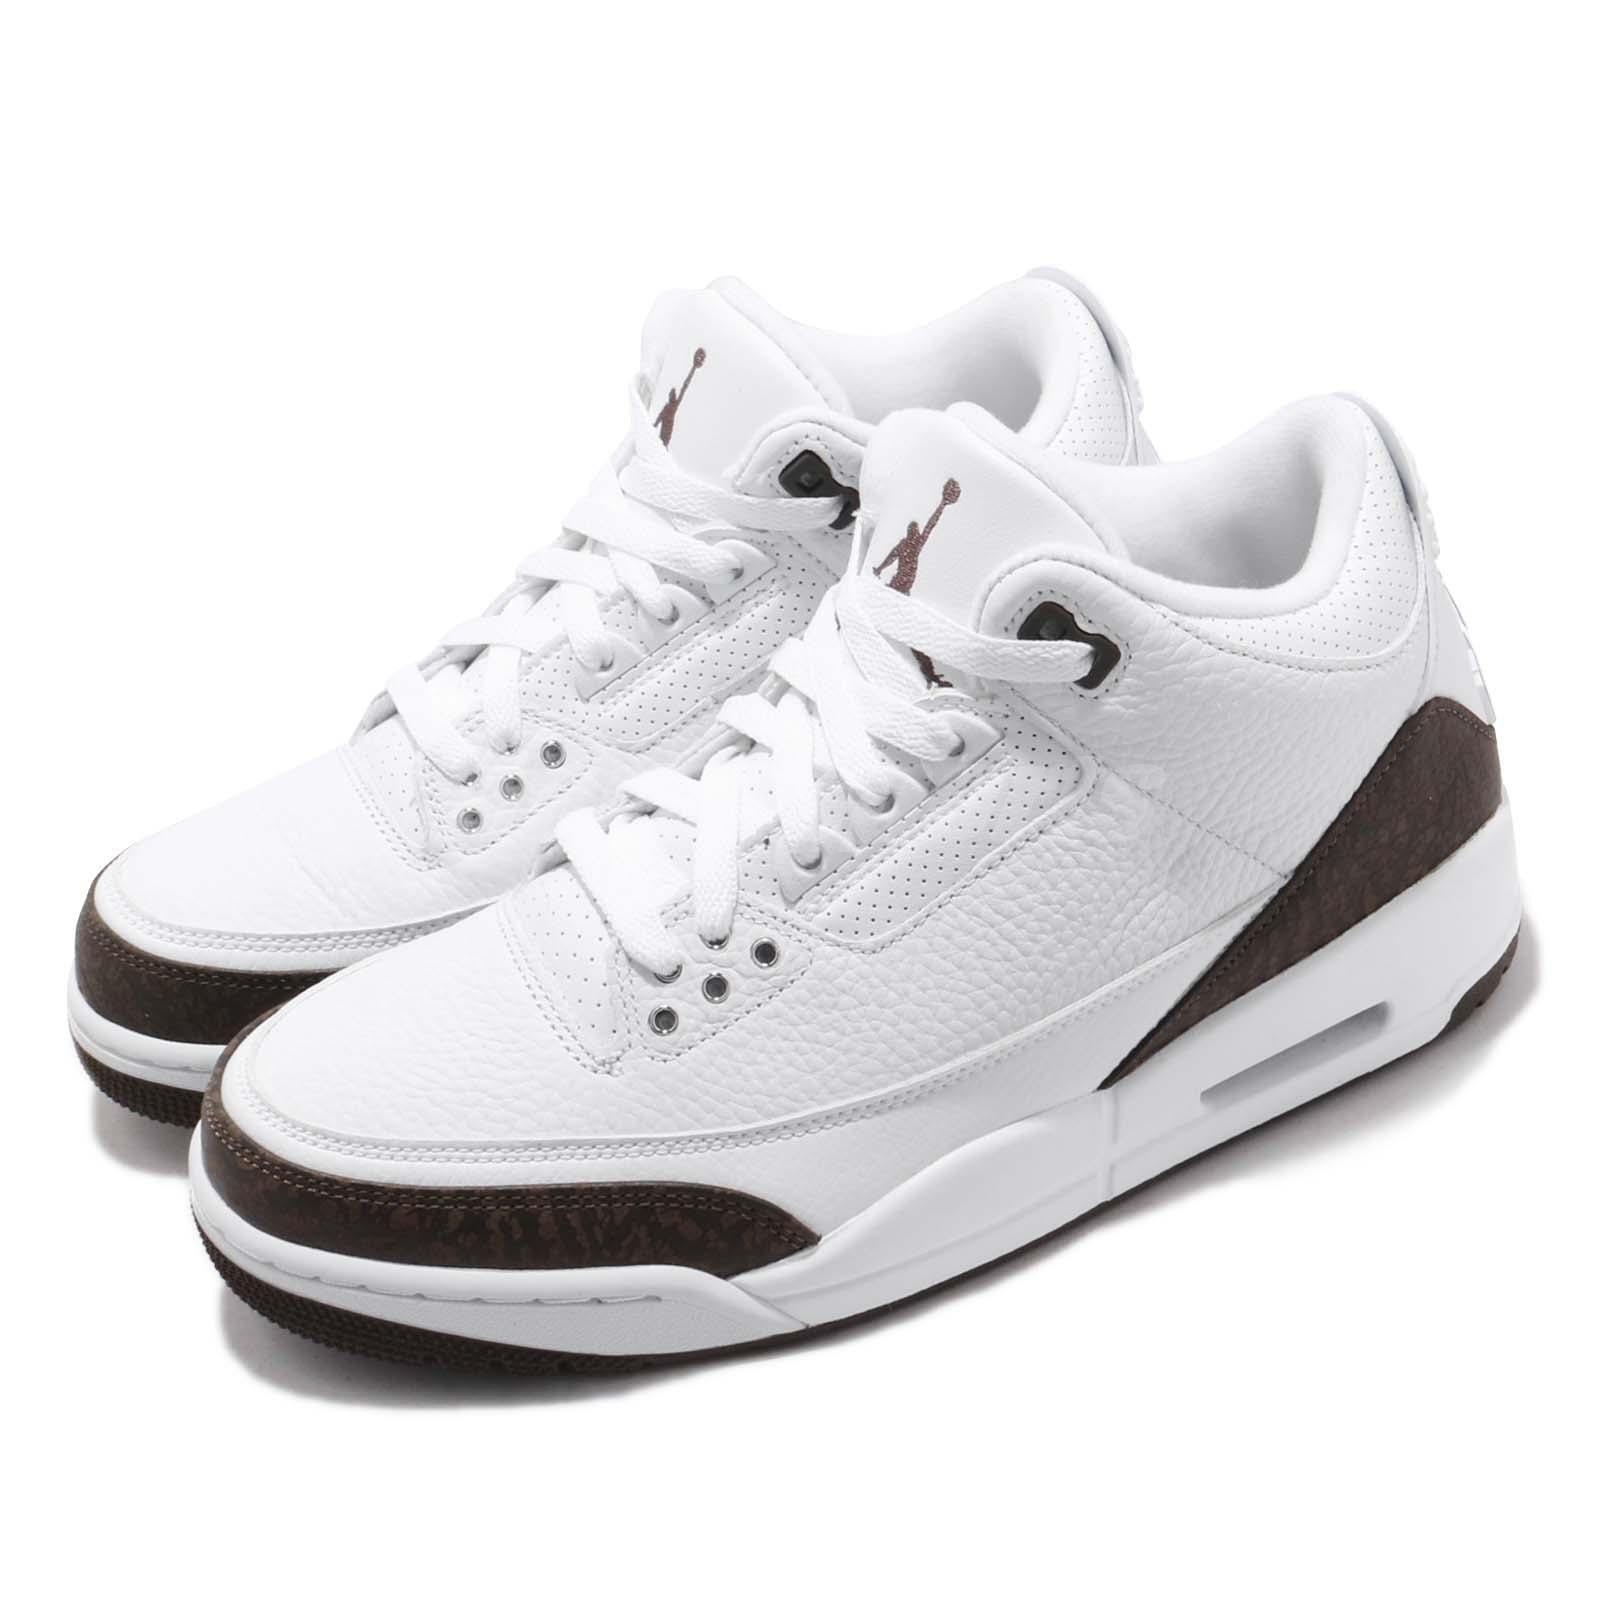 official photos 0ee3d 47f2a Details about Nike Air Jordan 3 Retro Mocha 2018 III AJ3 White Men Basketball  Shoes 136064-122